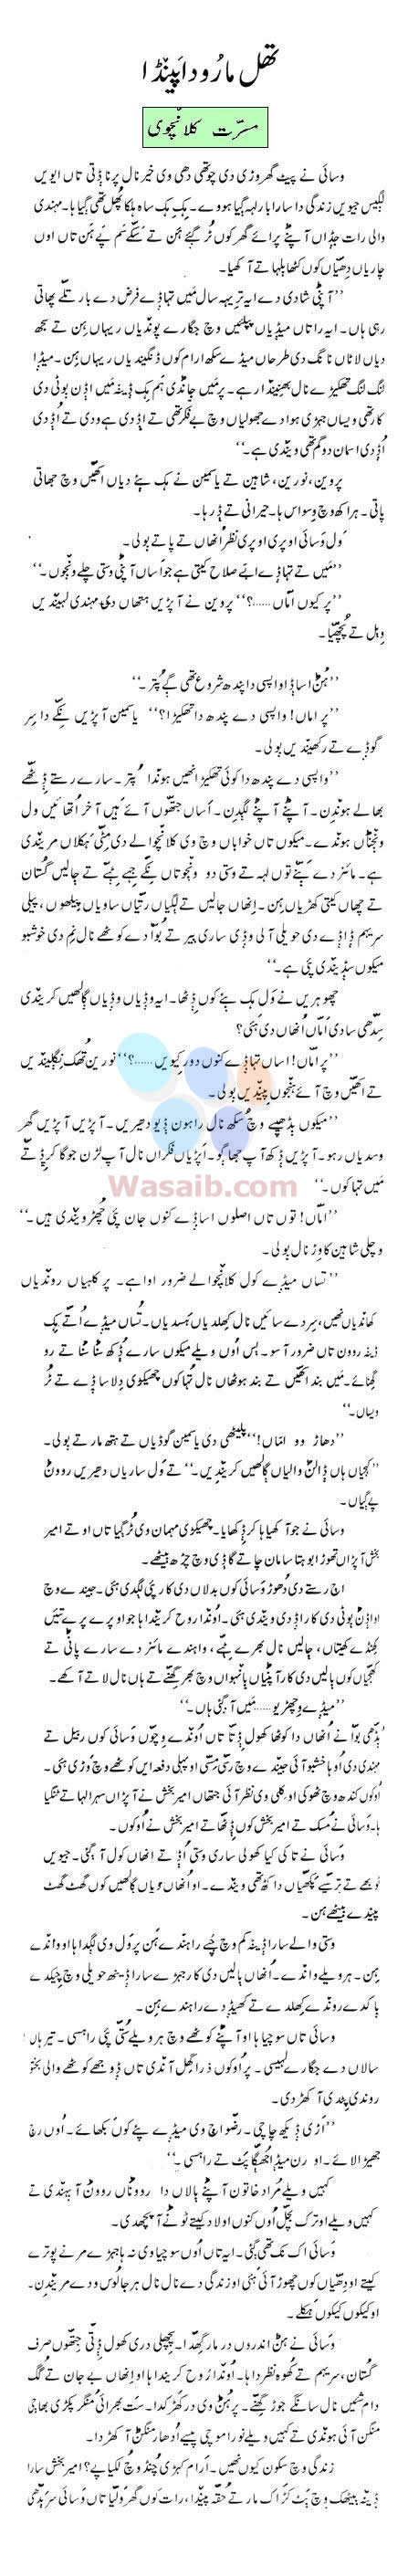 Seraiki Afsana Thal Maroo da paindah (Musarat Kalanchvi) Part-1